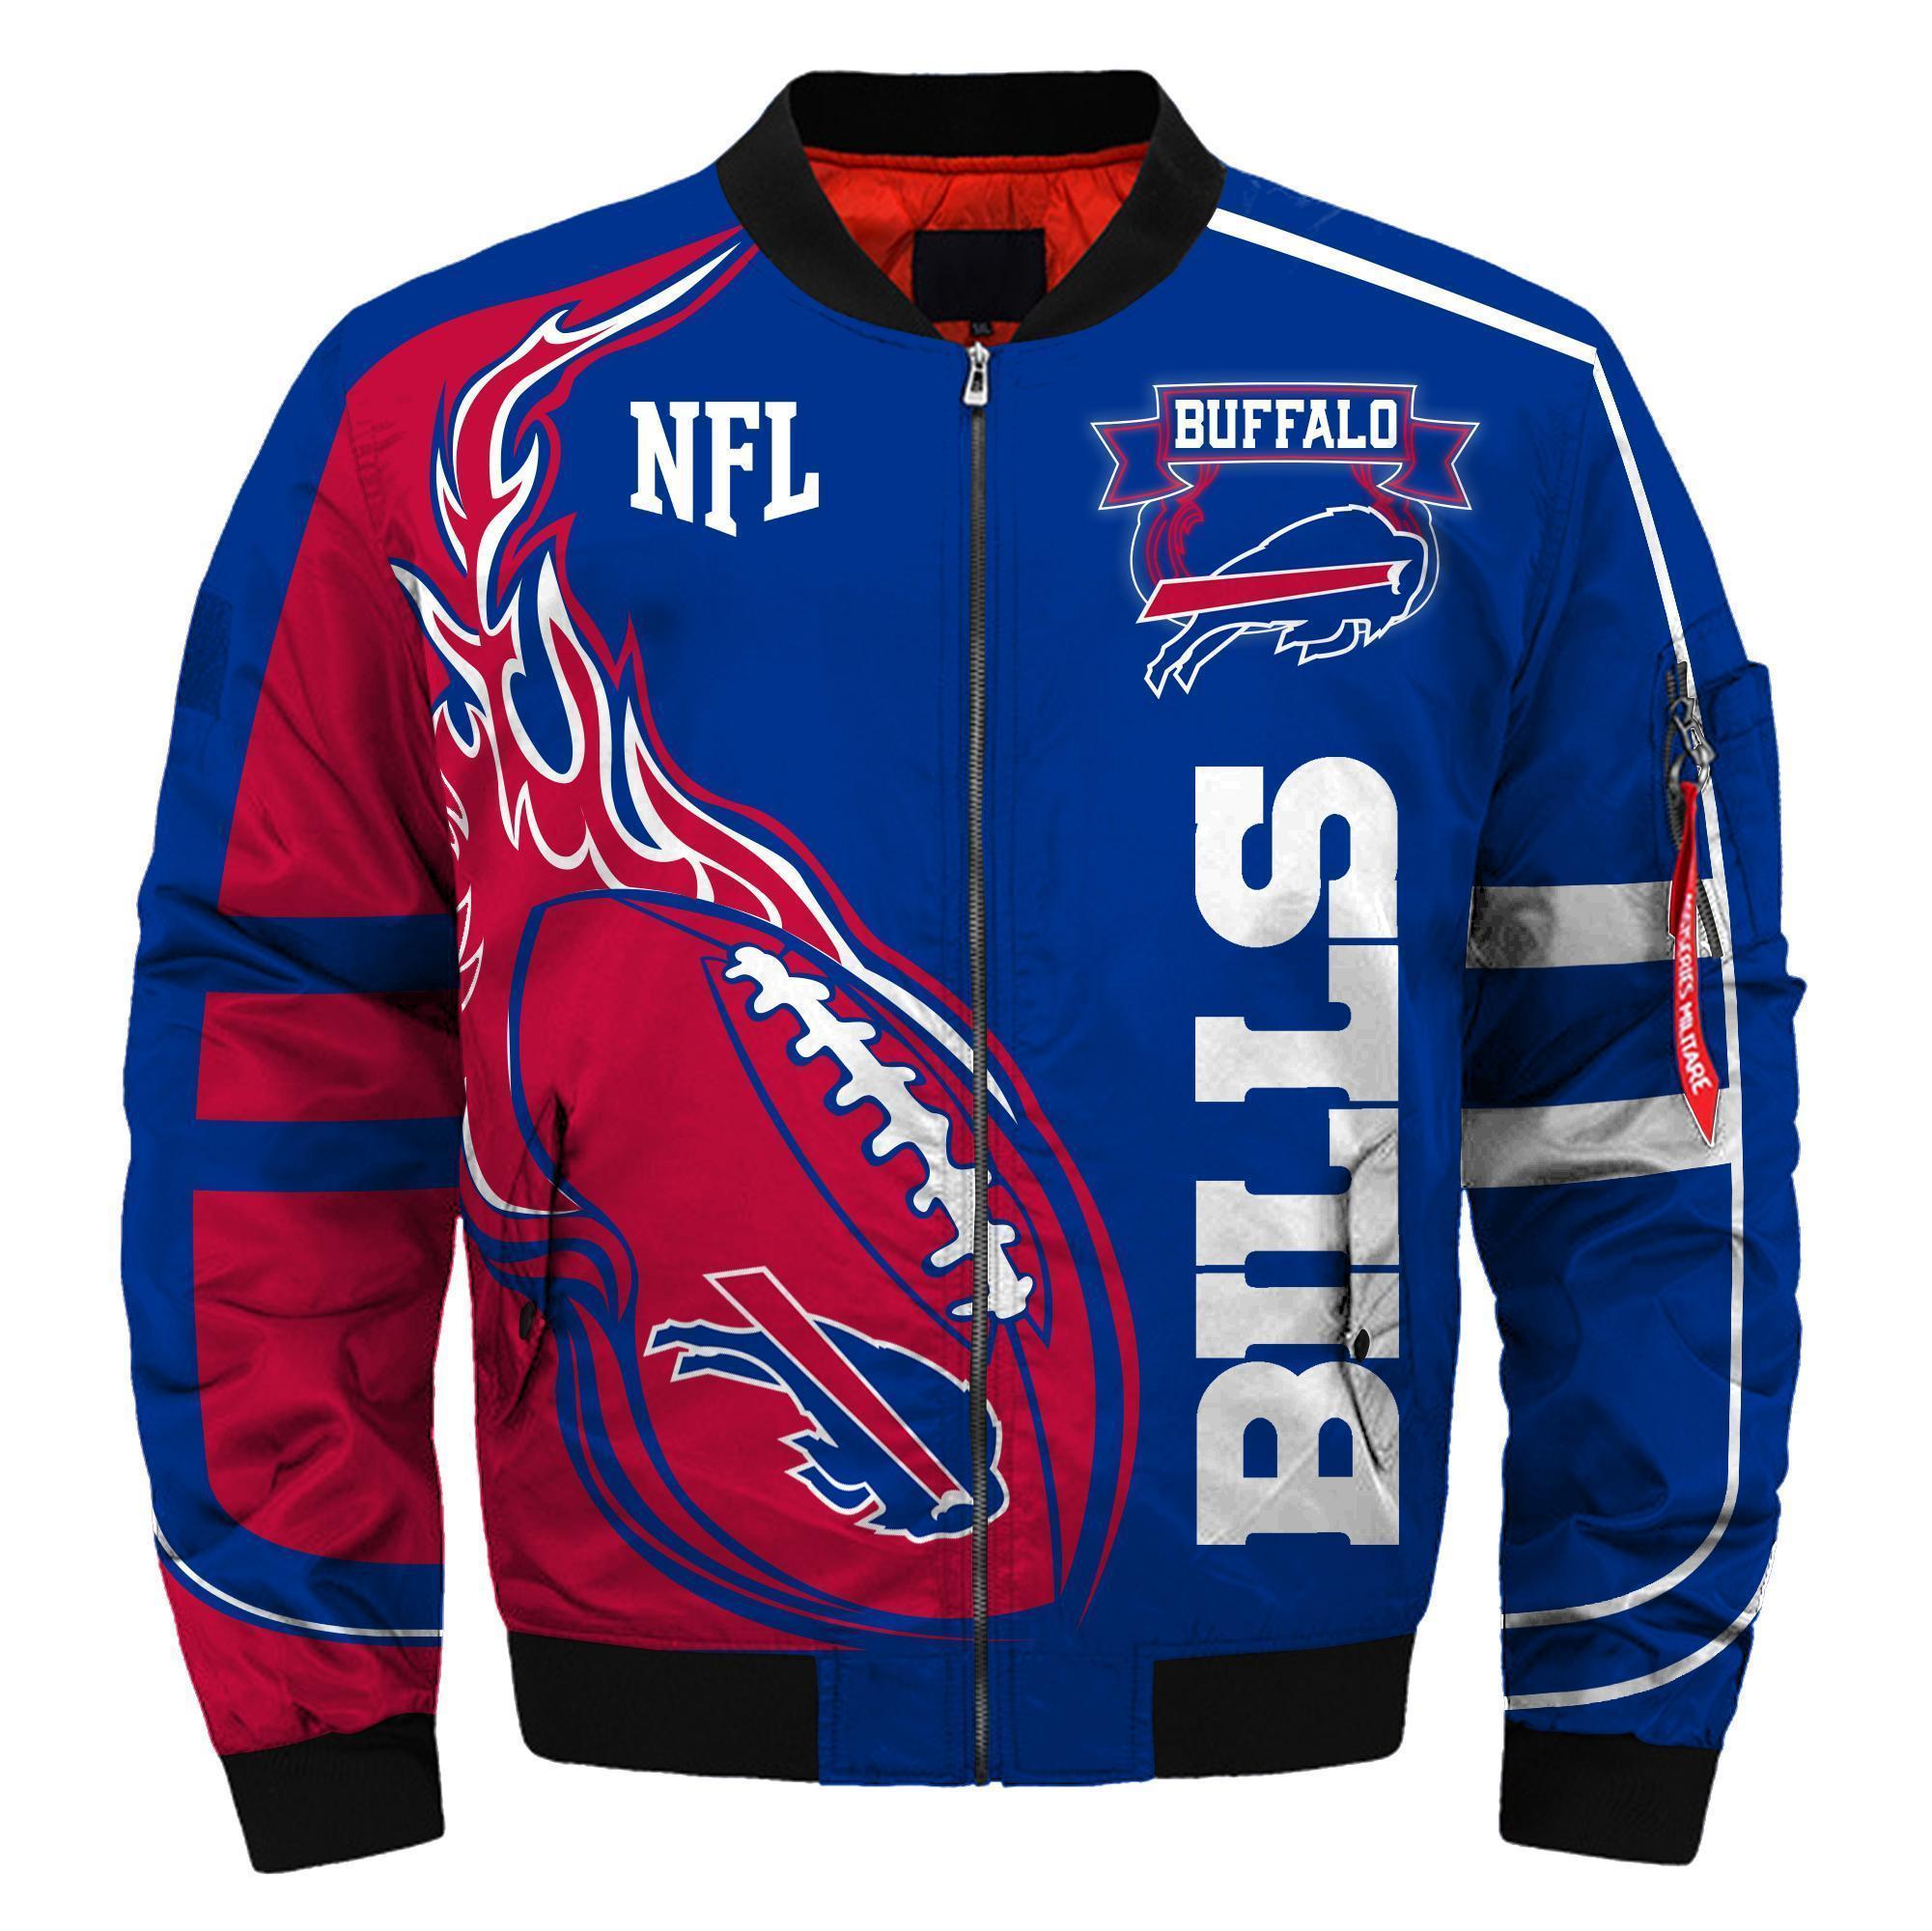 001 Nfl Buffalo Bills Custom North Face Winter Jacket Bomer High Quality Plus Size Jacket